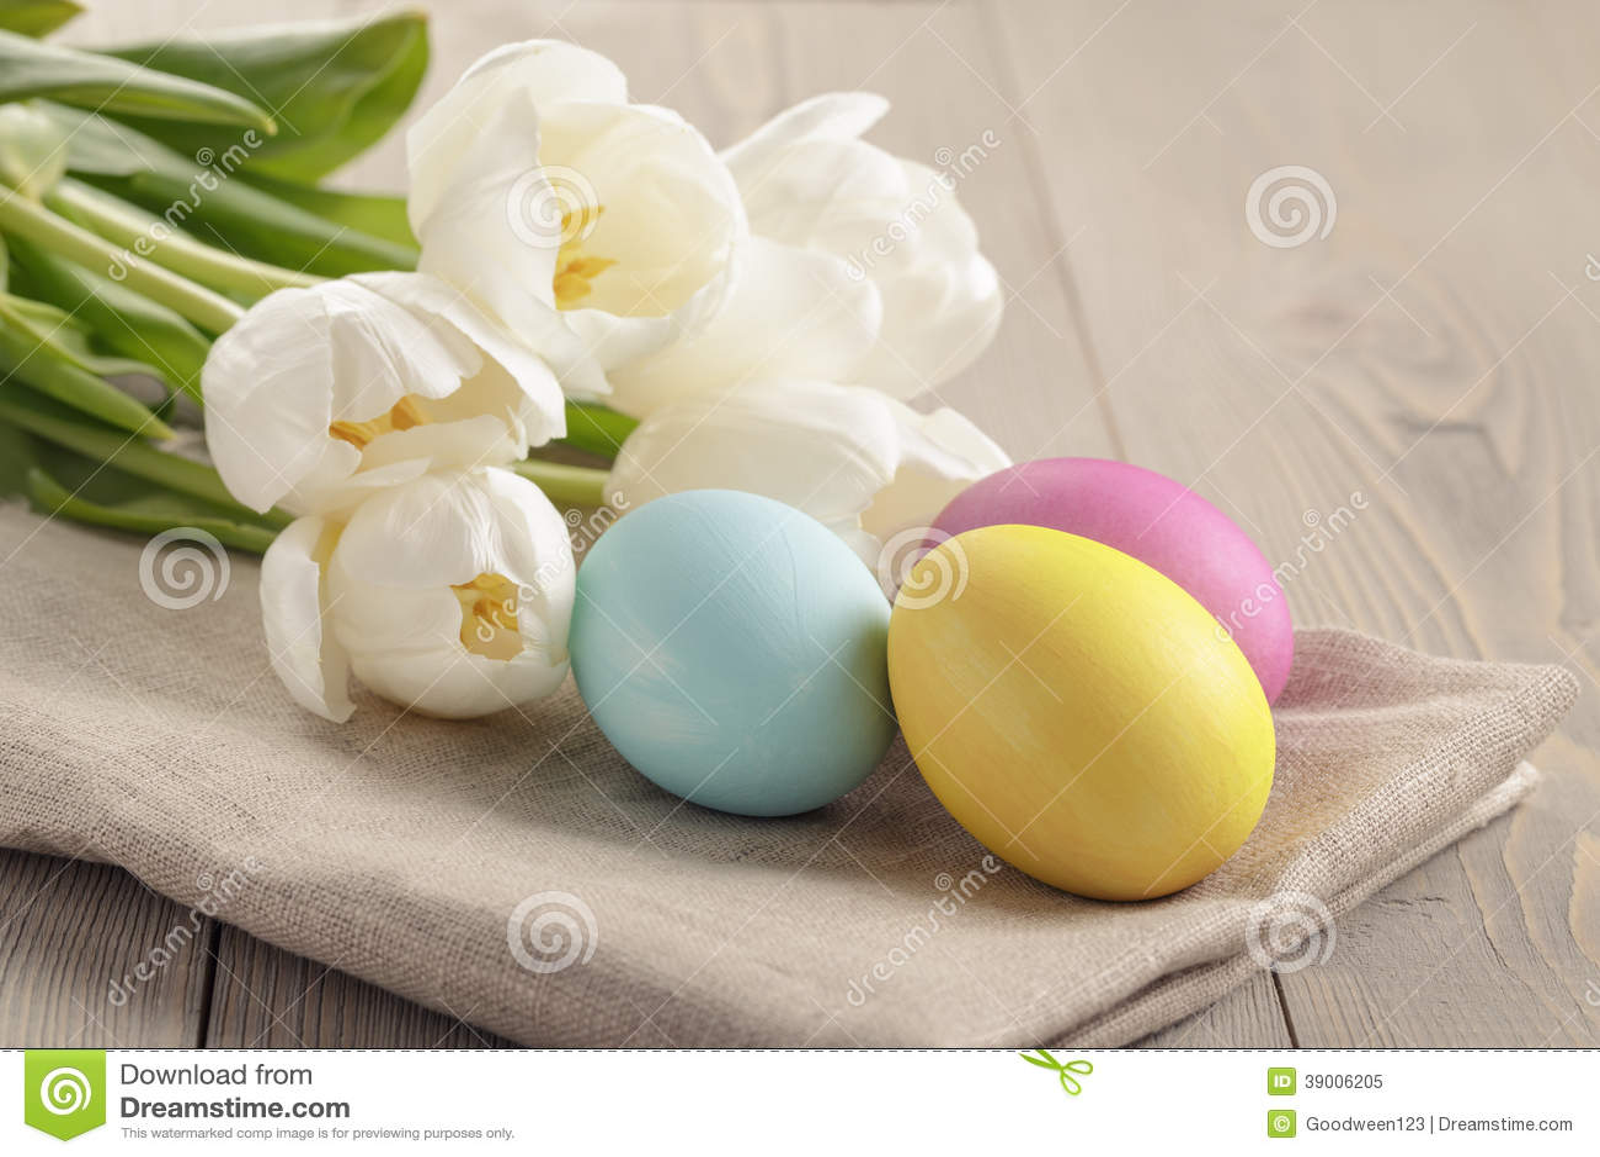 pastell farb ostereier mit tulpen auf tabelle stockfoto bild 39006205. Black Bedroom Furniture Sets. Home Design Ideas